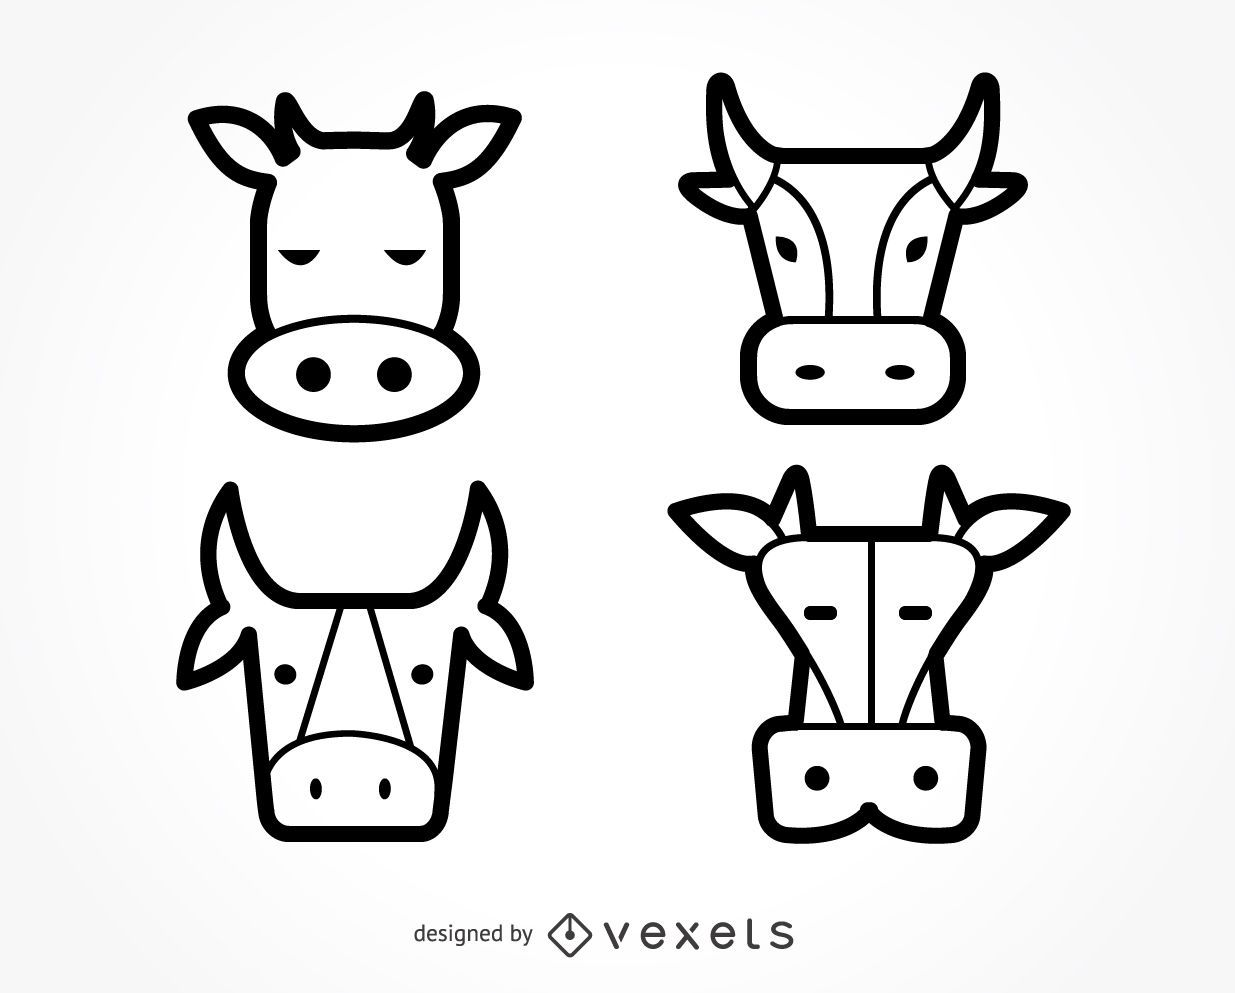 Cow icon illustration set